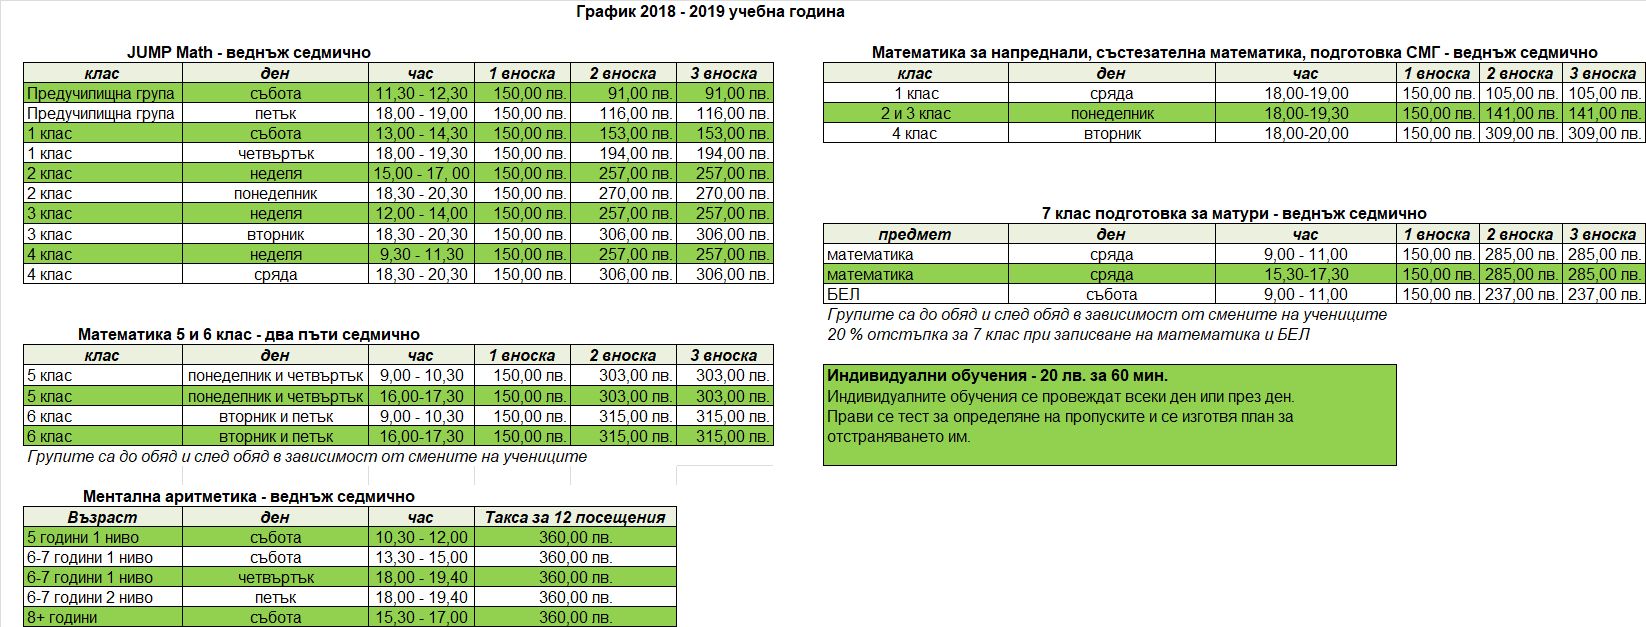 grafik 2018-2019